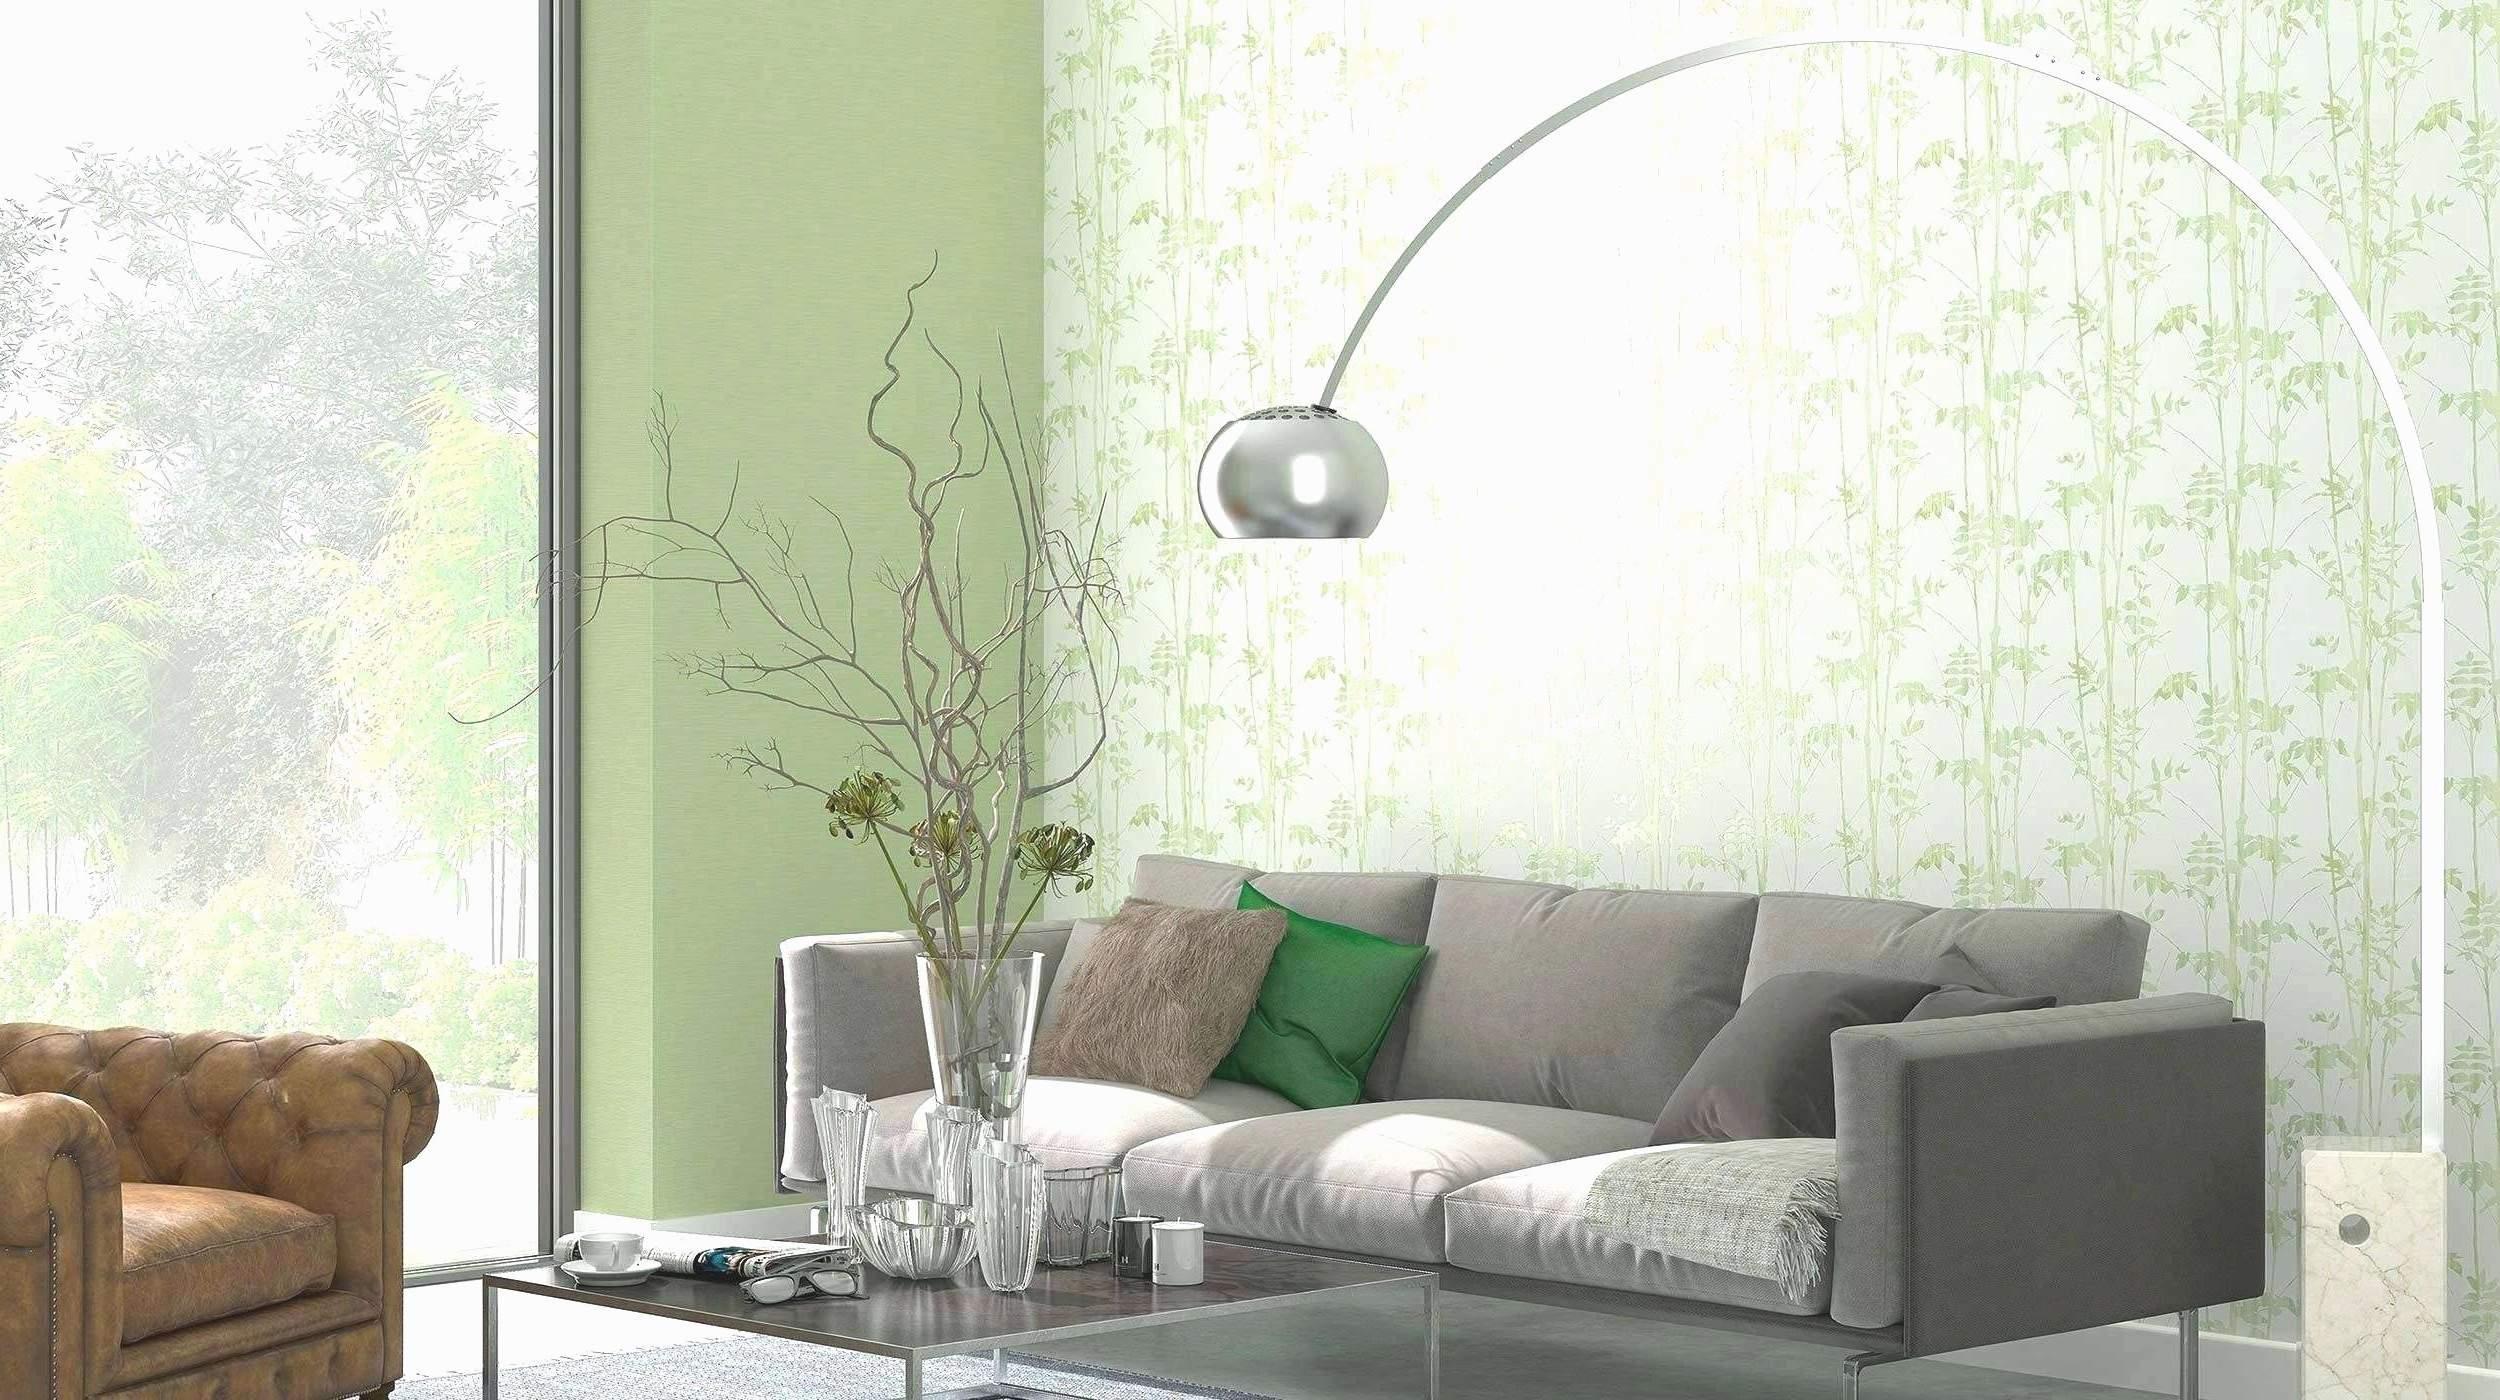 diy wohnzimmer inspirierend wanddeko ideen wohnzimmer design sie mussen sehen of diy wohnzimmer